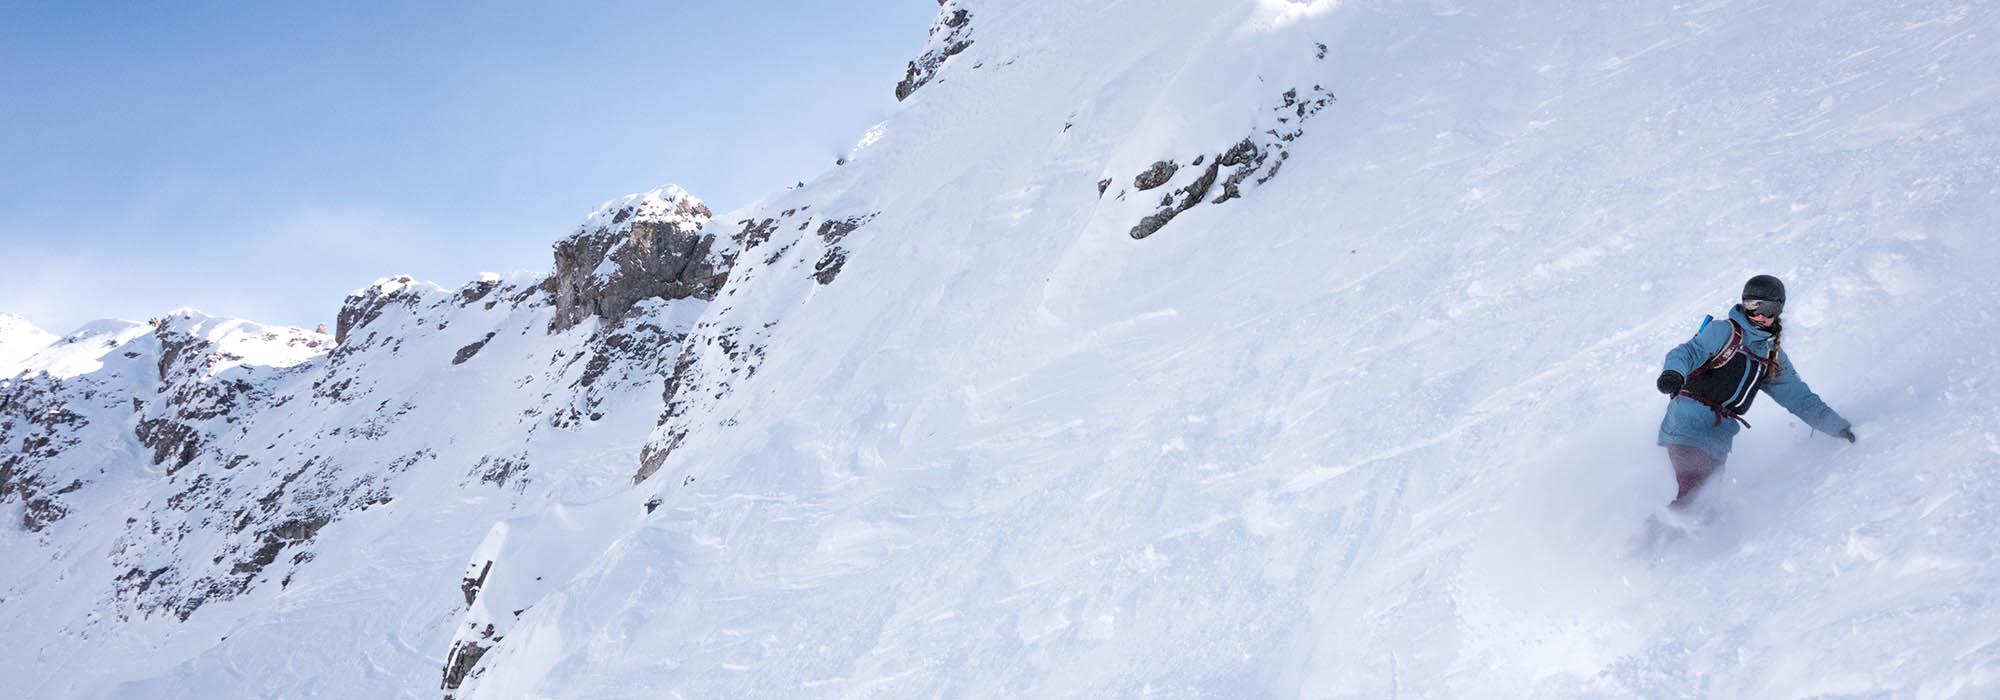 Snowboarder in Delirium Dive at Banff Sunshine Village, Banff National Park.